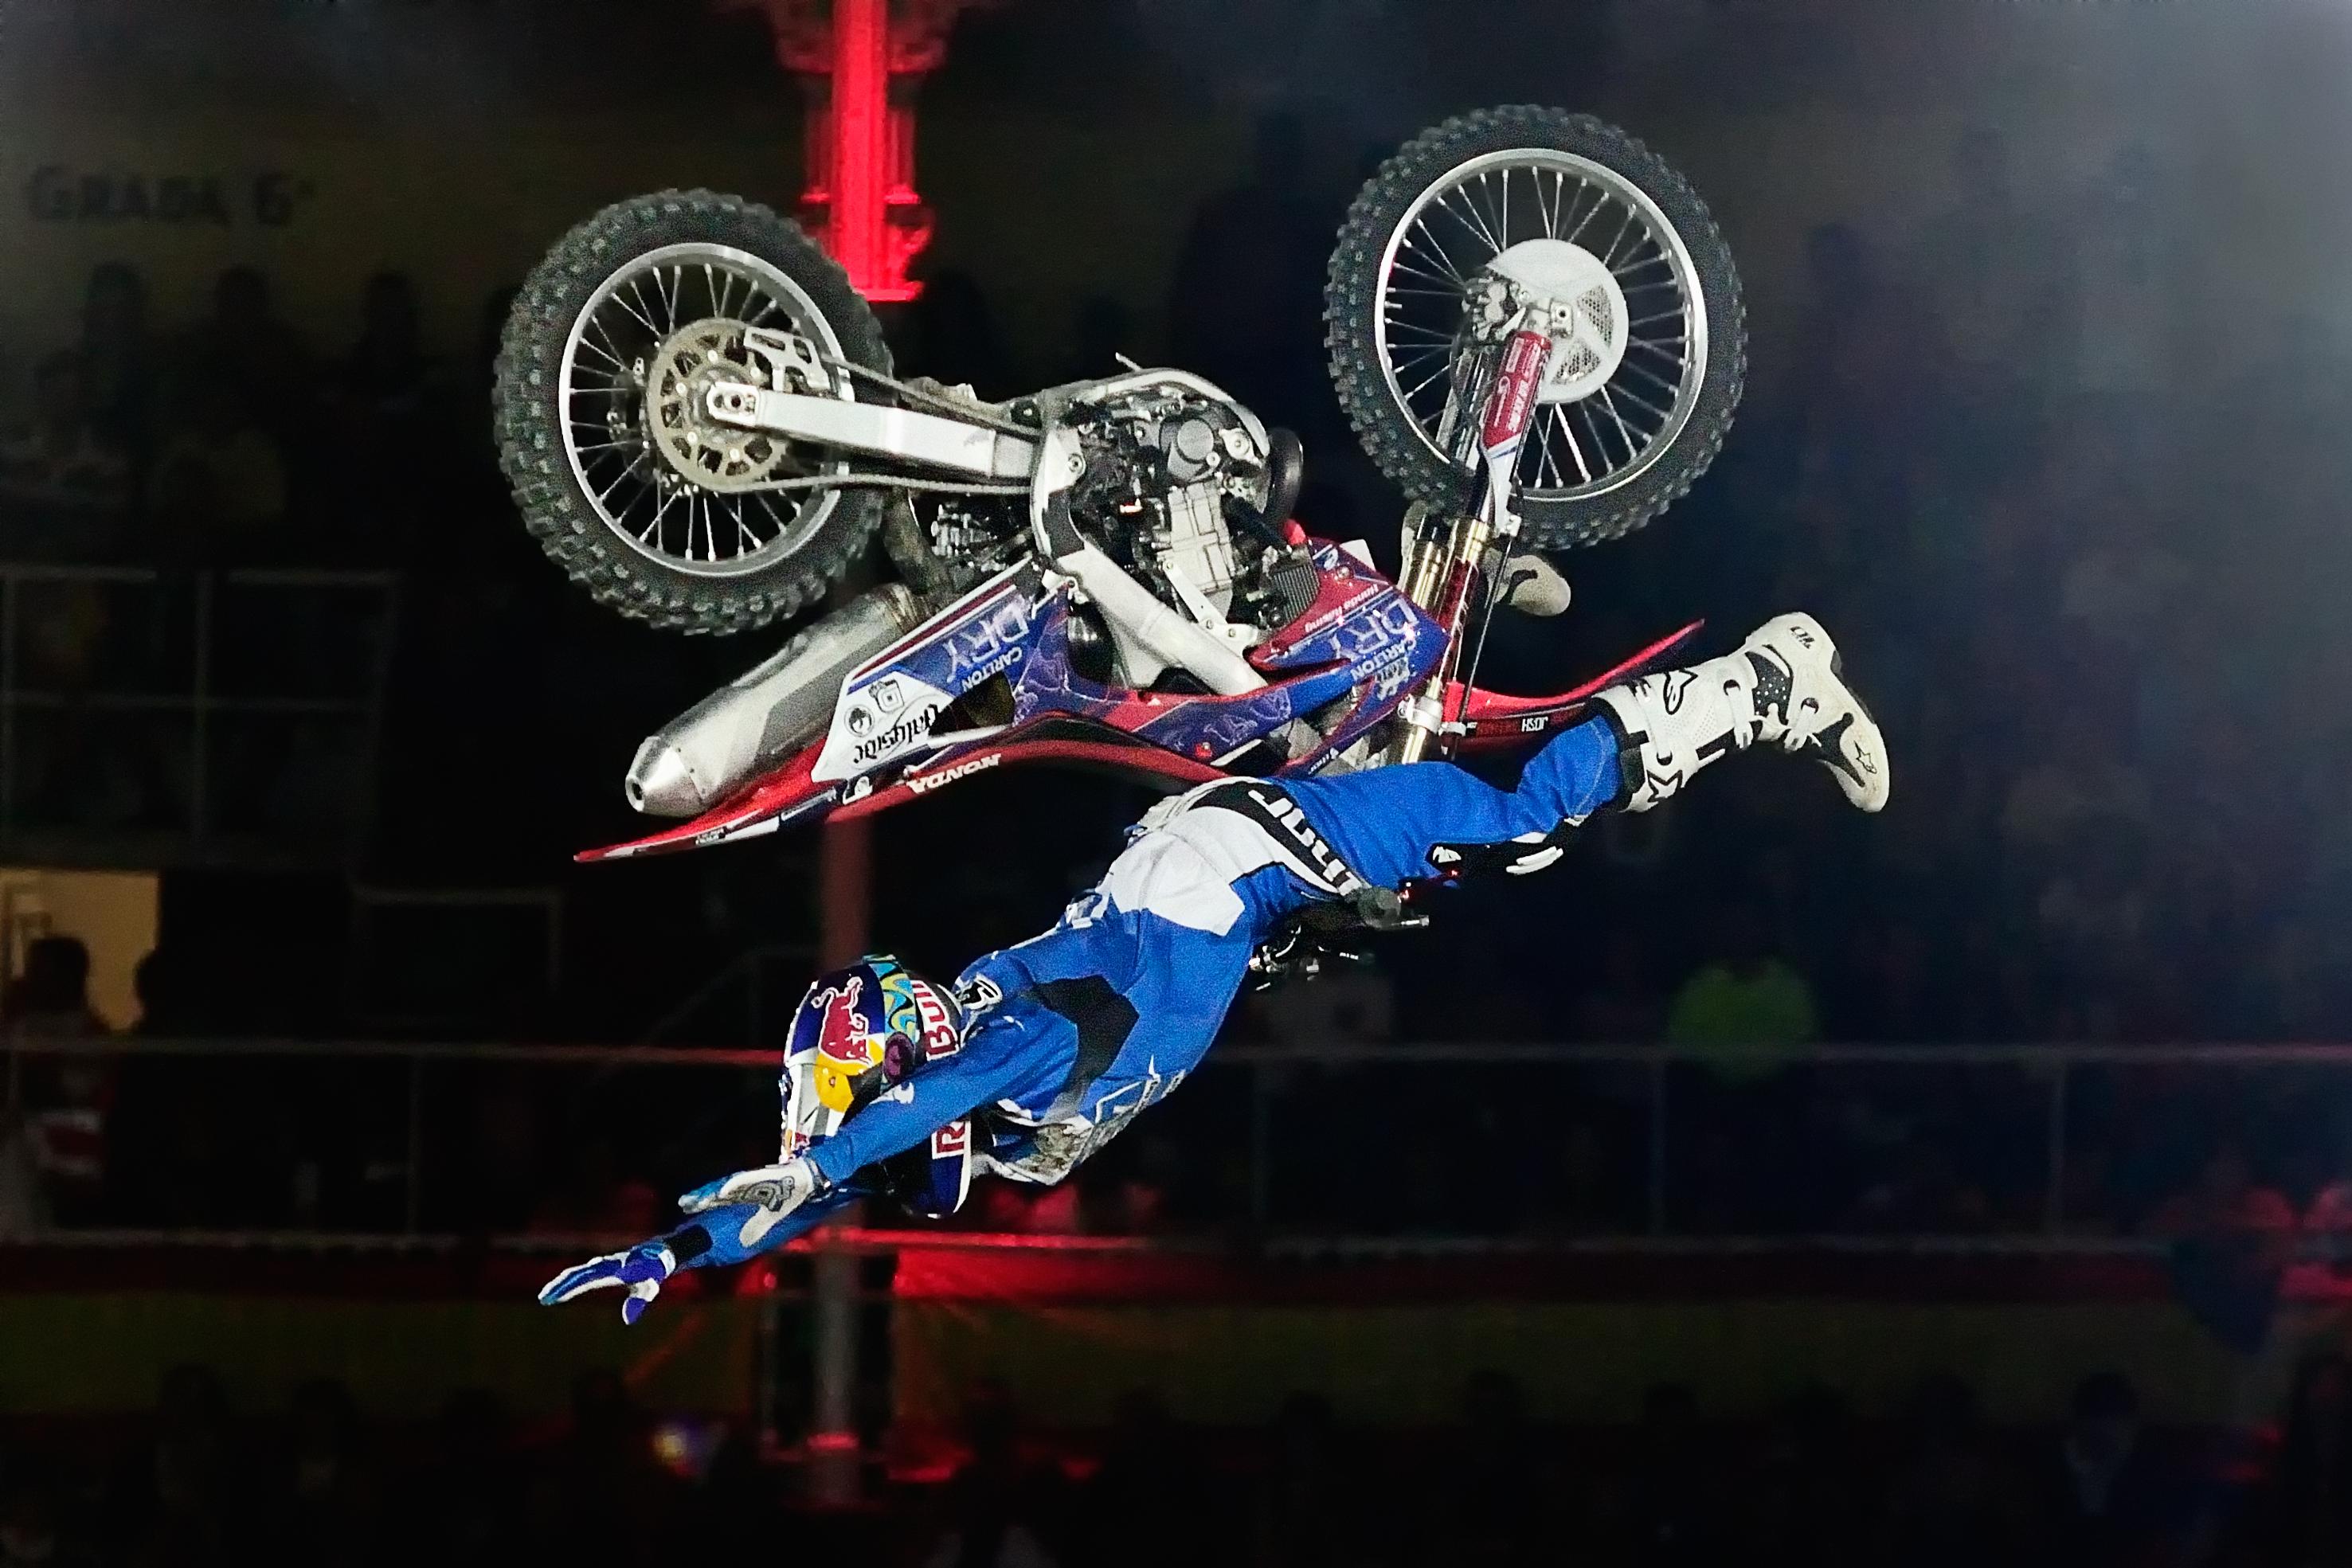 Red Bull : Le marketing des sports extrêmes